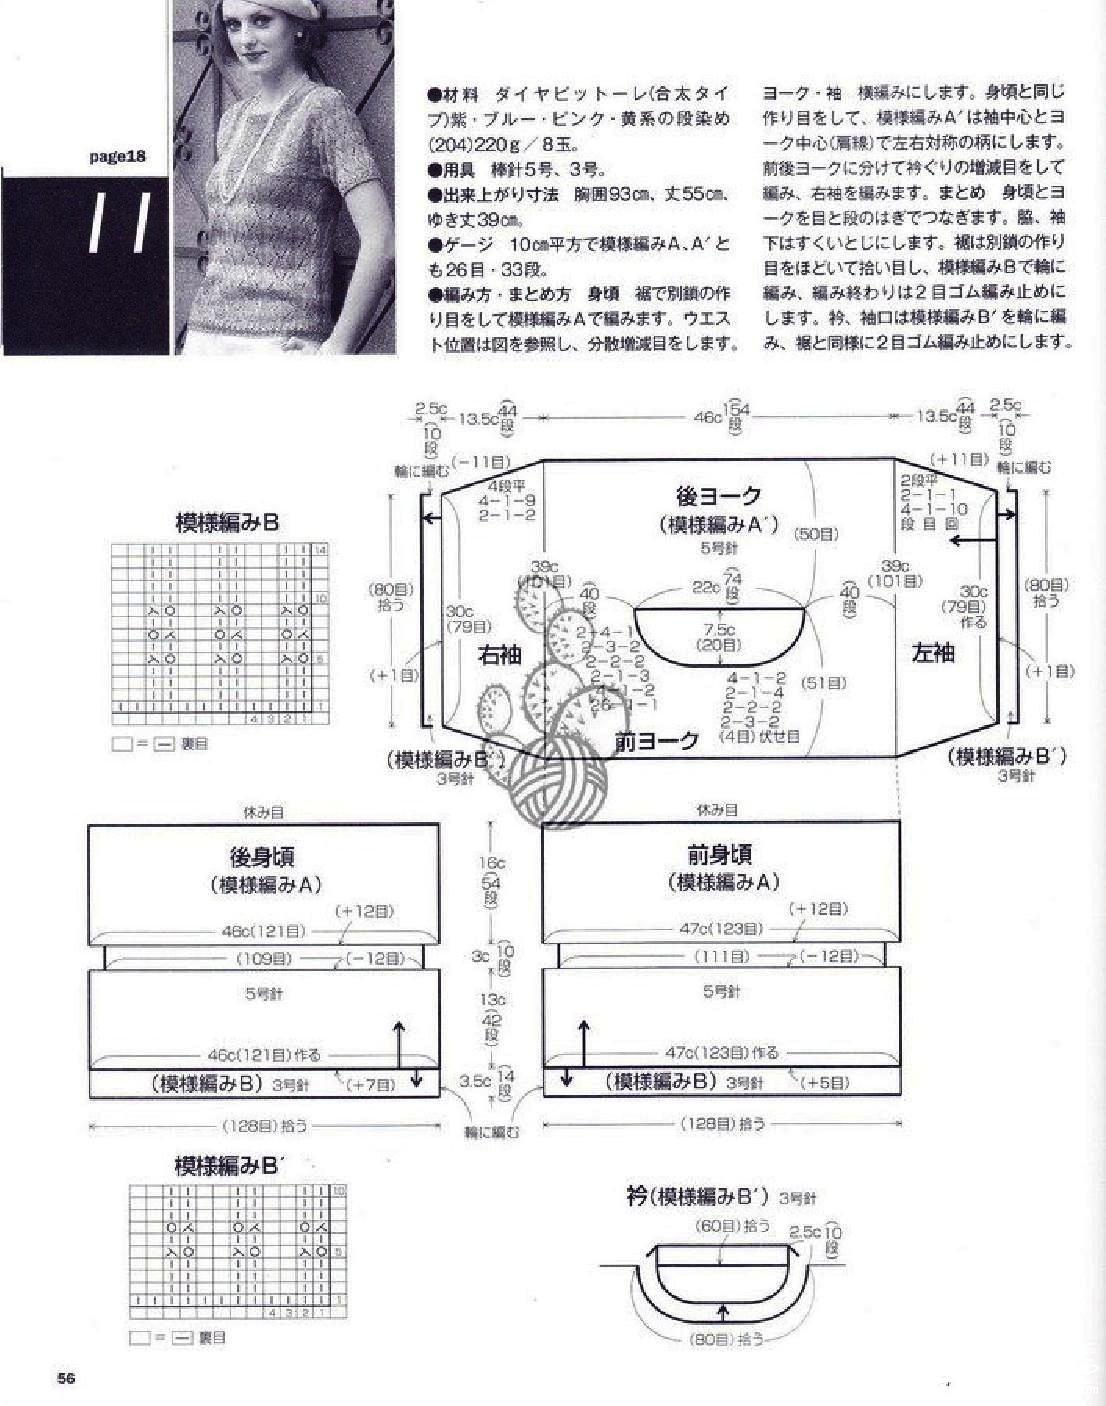 NV80258_page56_image1.jpg